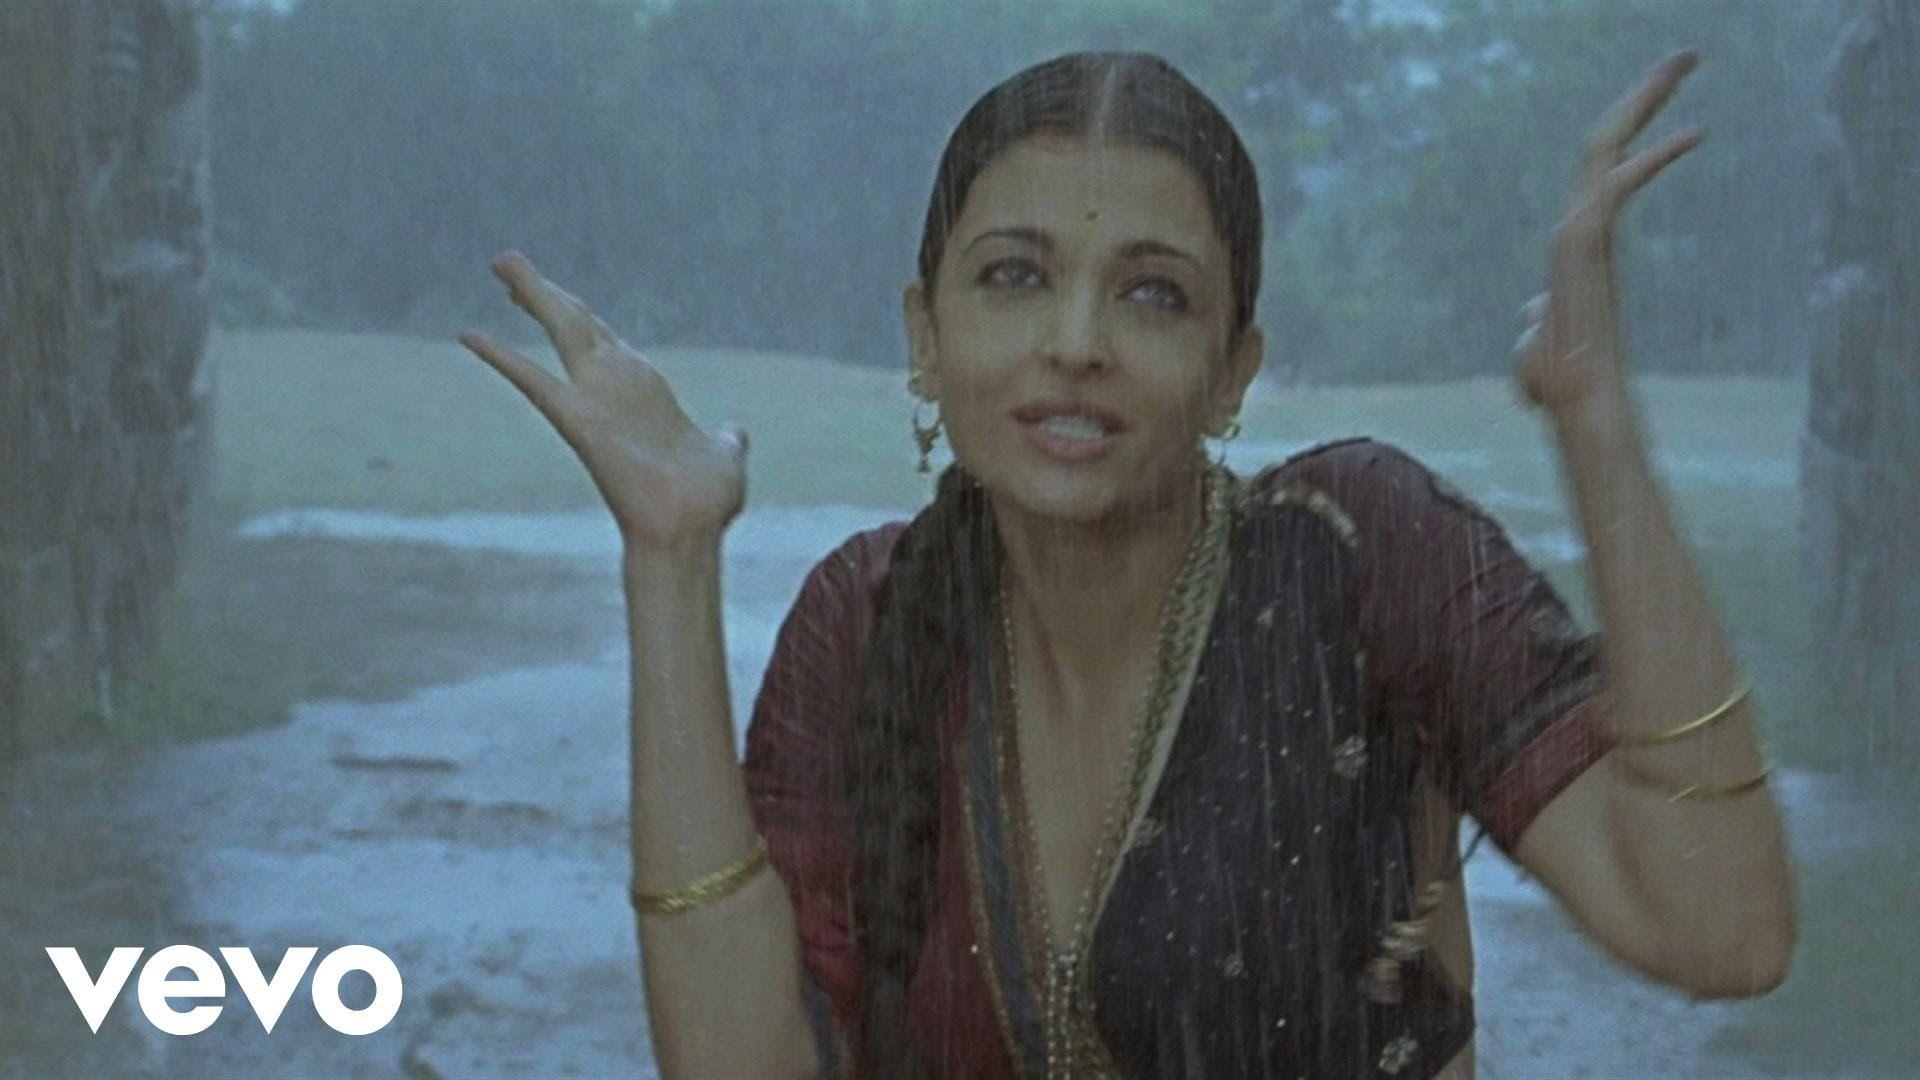 Barso Re Guru Aishwarya Rai Bachchan Shreya Ghoshal Songs Bollywood Music Bollywood Songs